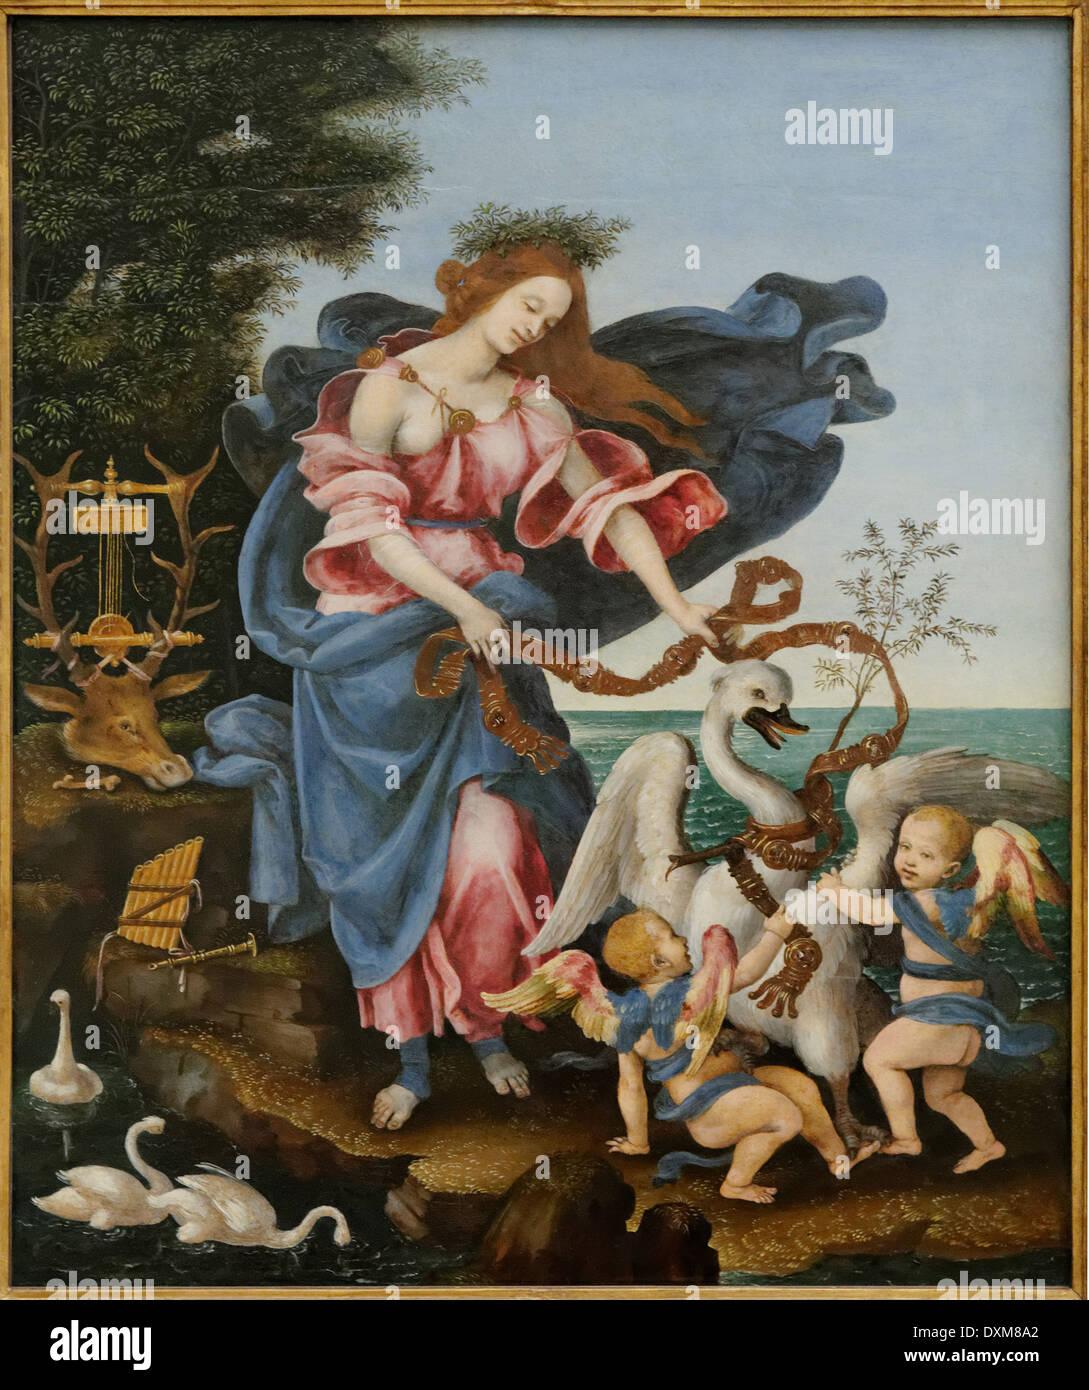 Filippino Lippi - Music Allegory - 1500 - XVI th Century - Italian School - Gemäldegalerie - Berlin Stock Photo